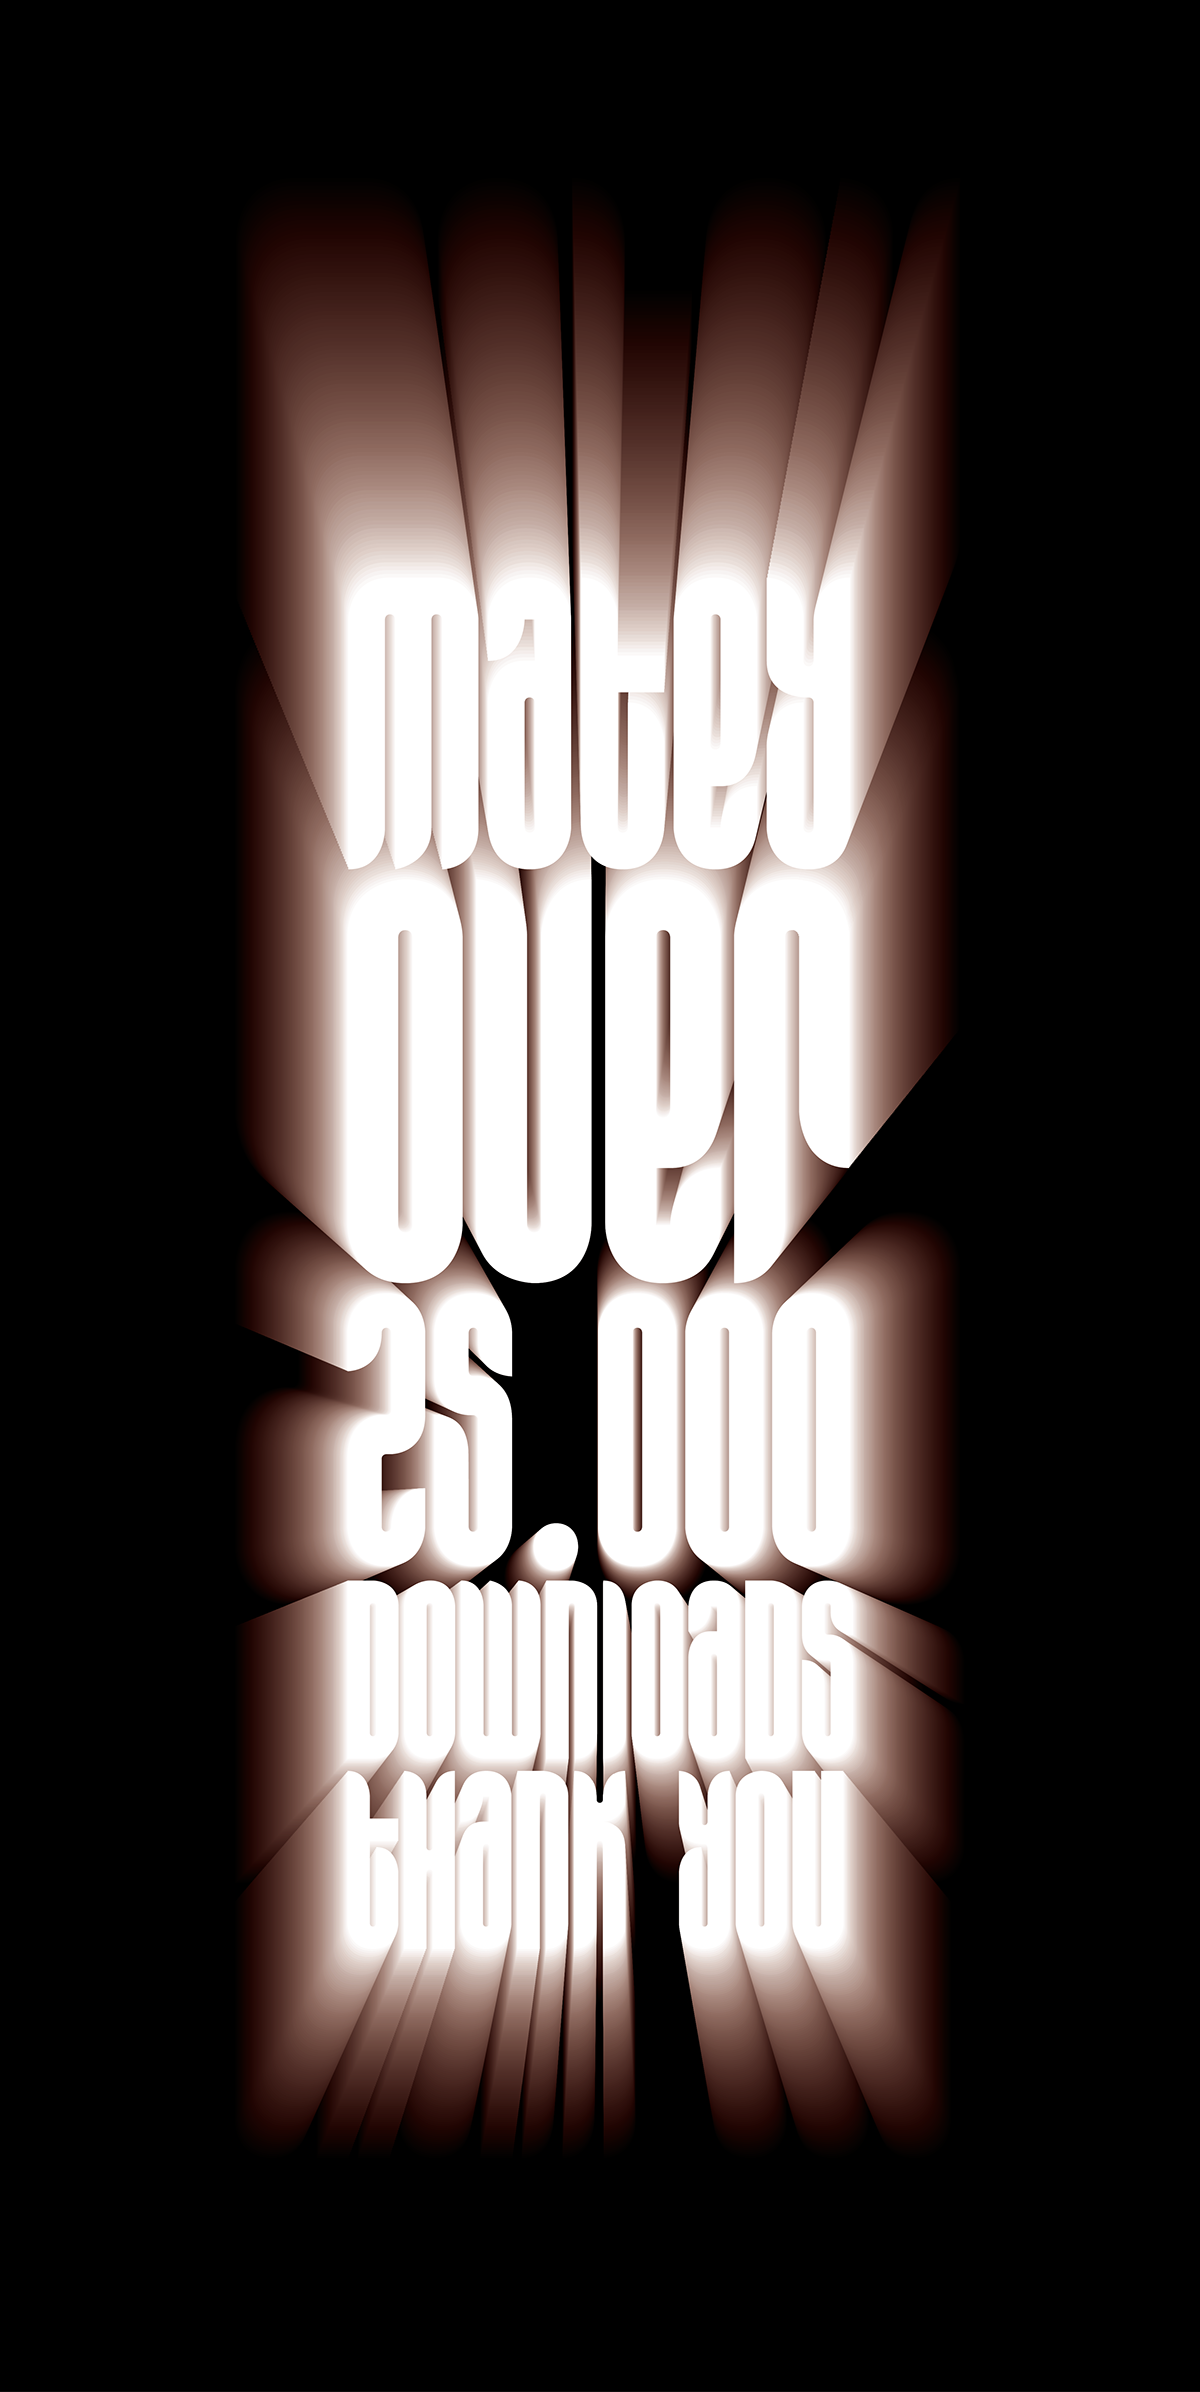 type font Typeface letter andreas leonidou poster free art comic zombie trendy fresh new logo Logotype decorative alt alt foundry alt type foundry typographic Retro